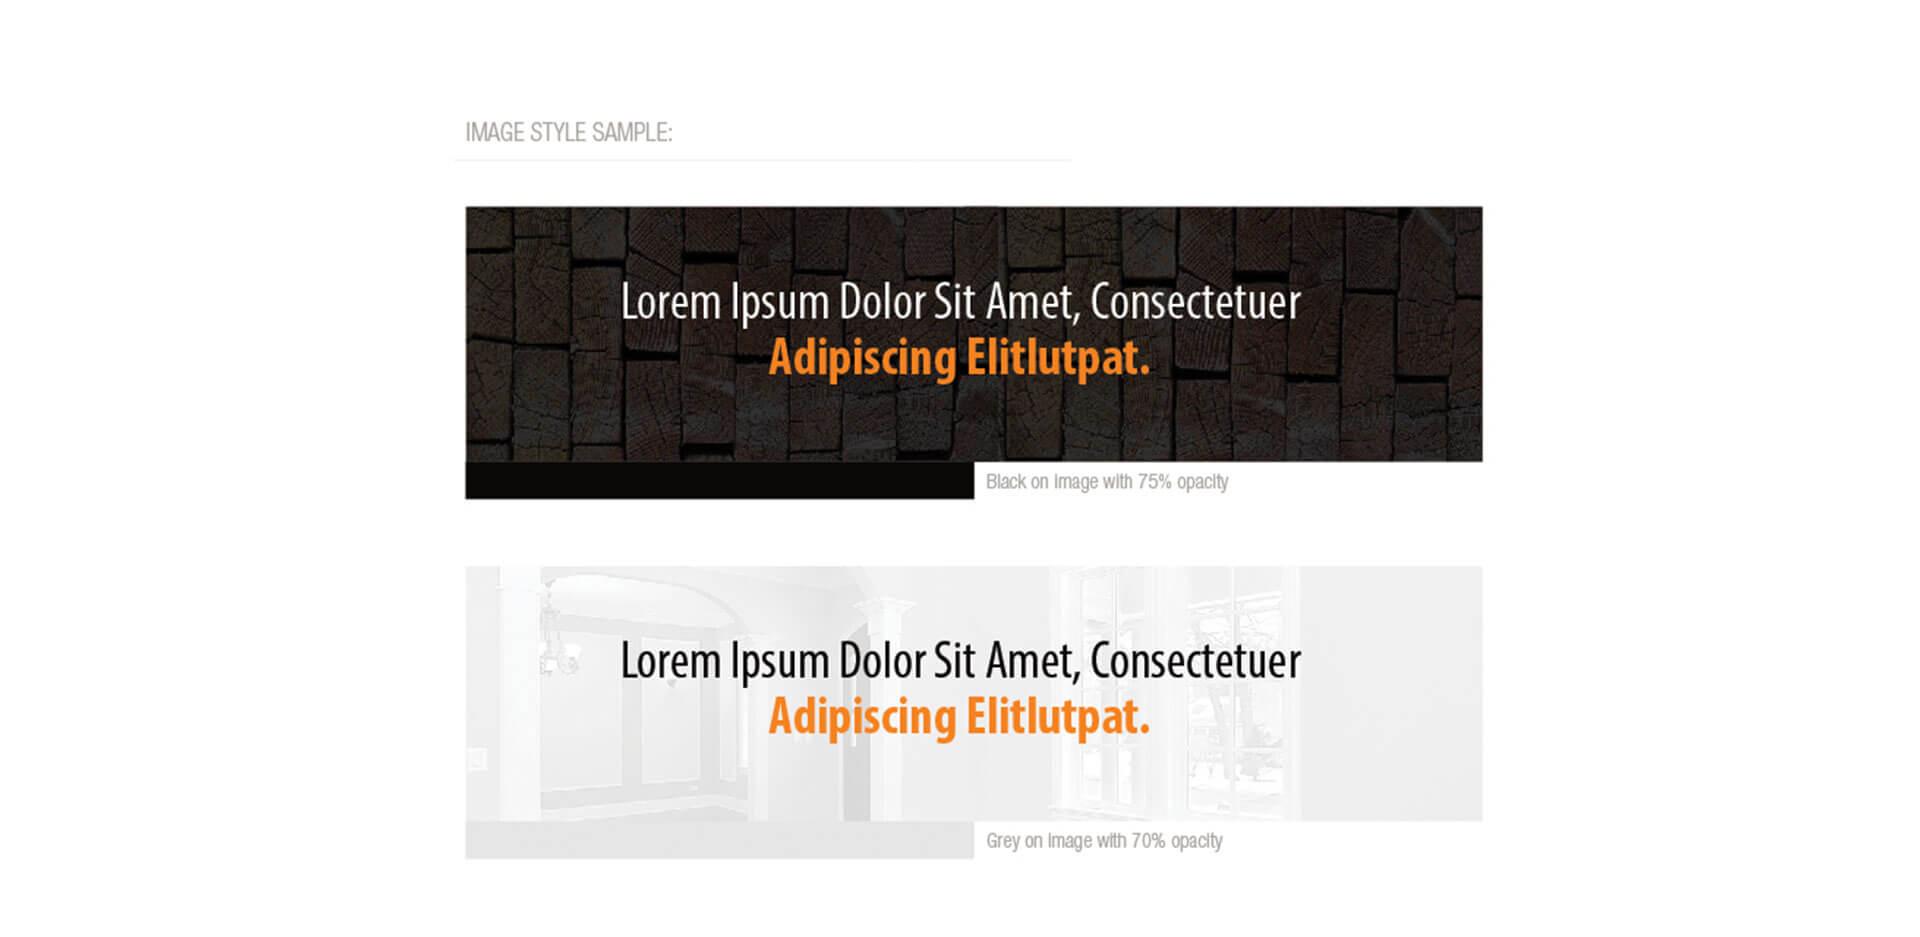 Brand-Guide-slider-image-style-sample